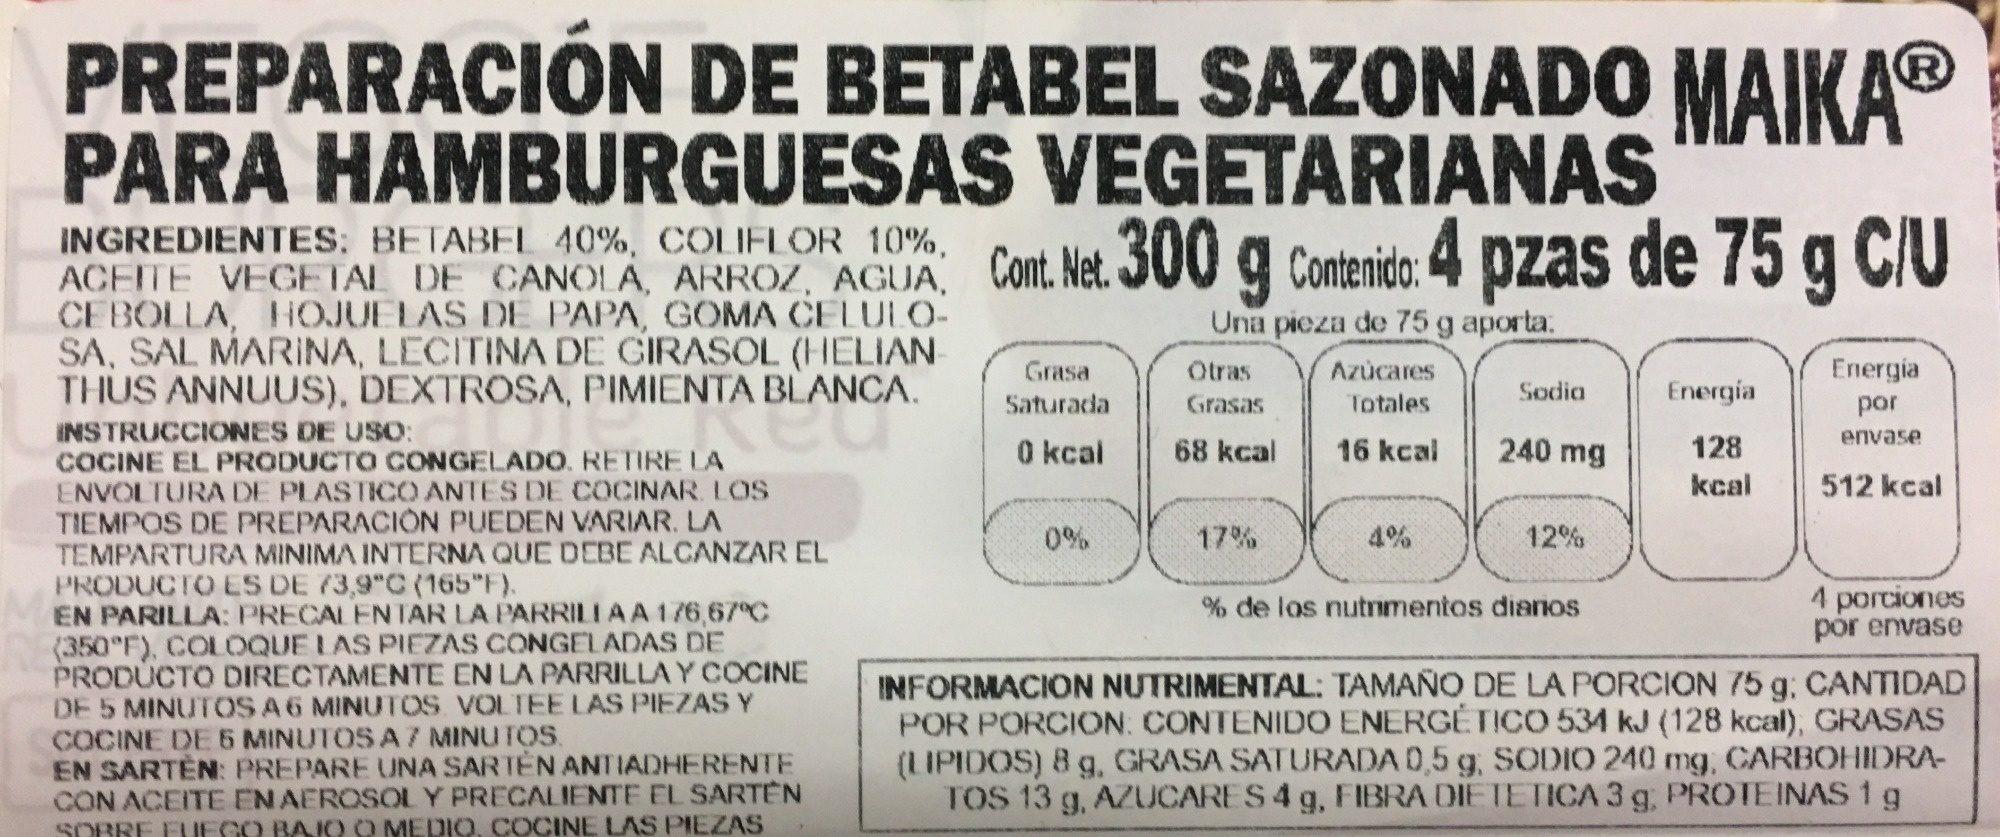 Maika, Artisan Crafted Veggie Burgers, Beet - Información nutricional - es